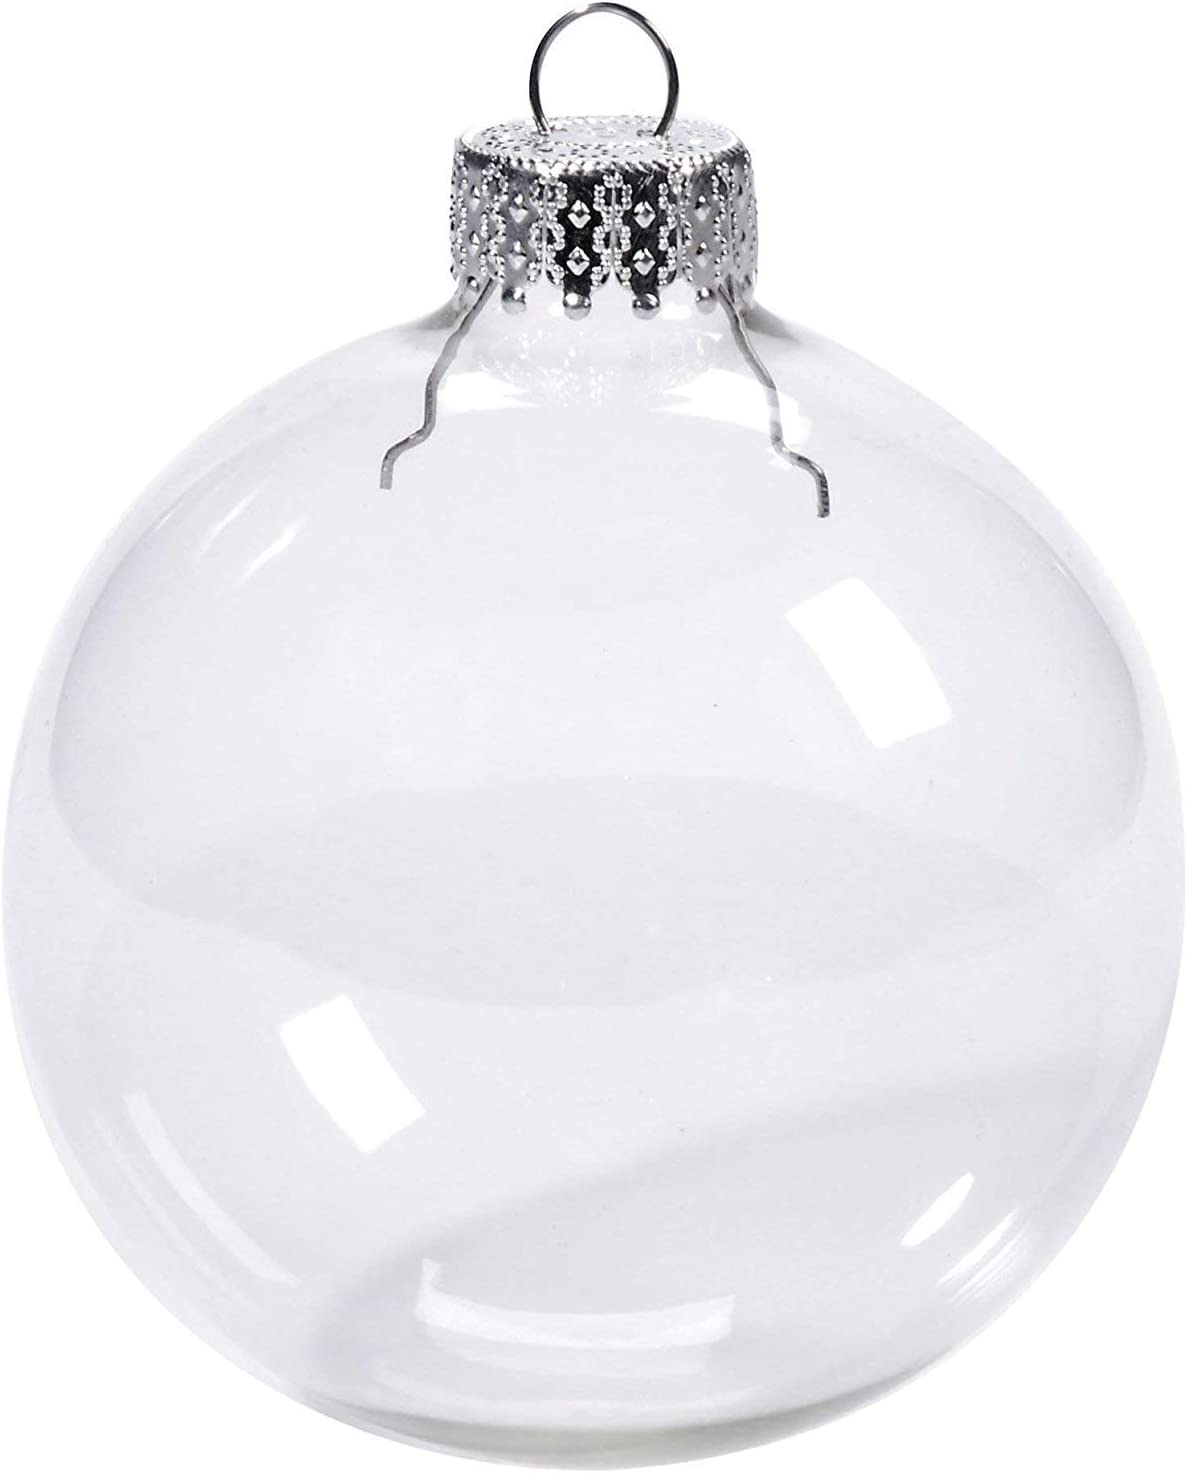 Darice 2610-42 6-Piece Heavy Duty Glass Balls Clear Glass 70mm